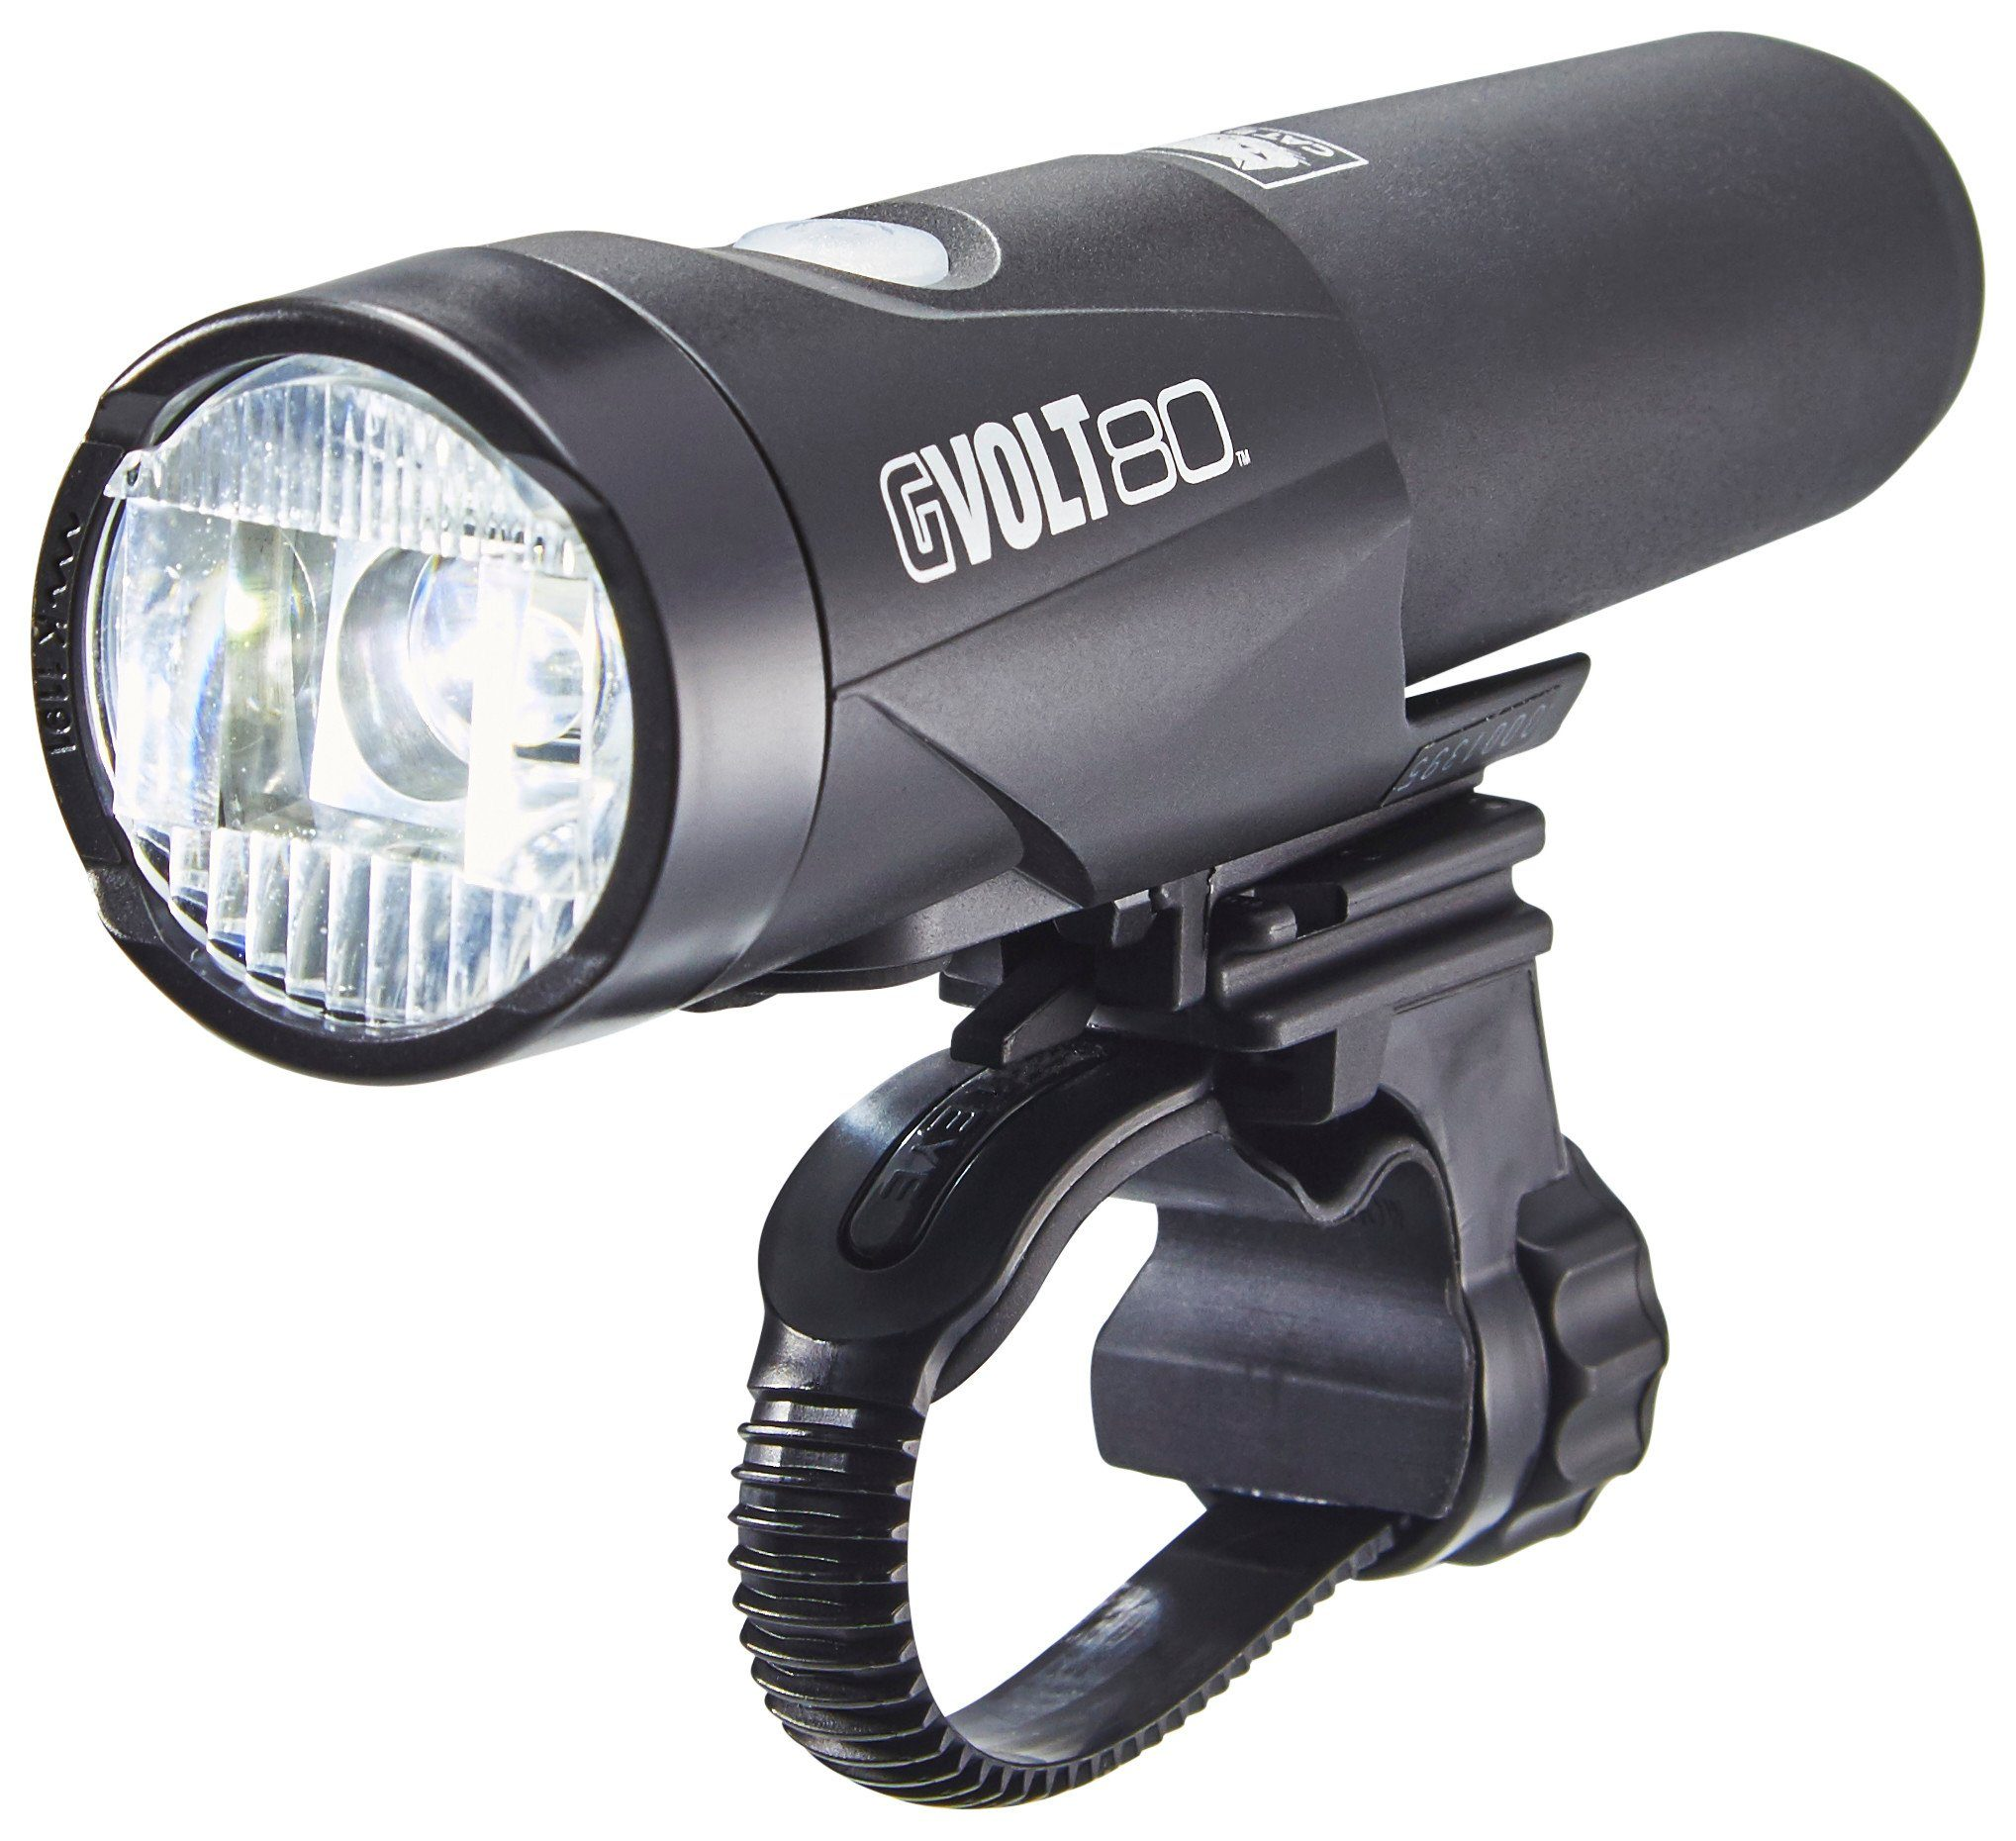 Cateye Fahrradbeleuchtung »GVOLT80 HL-EL560GRC Scheinwerfer«